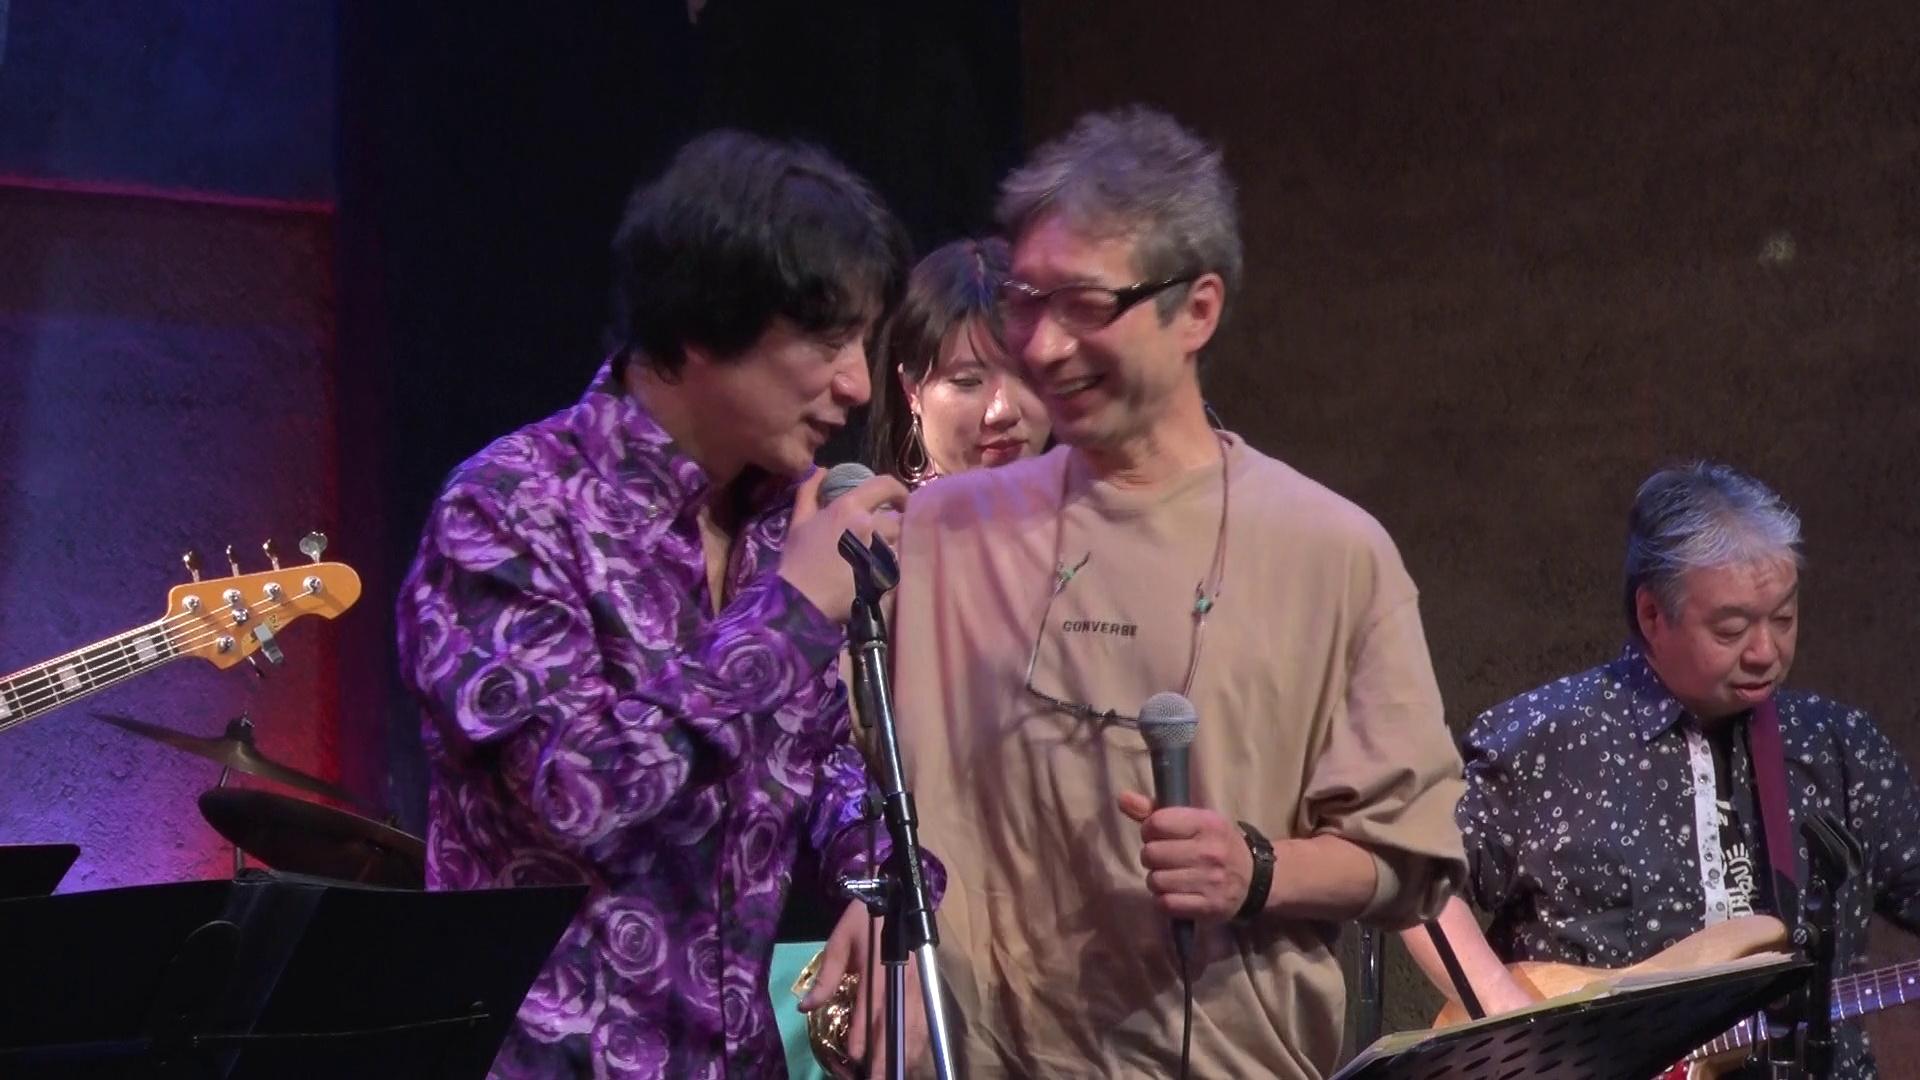 30th Anniversary LIVE 後記 【千沢仁さん】_d0353129_15521939.jpg